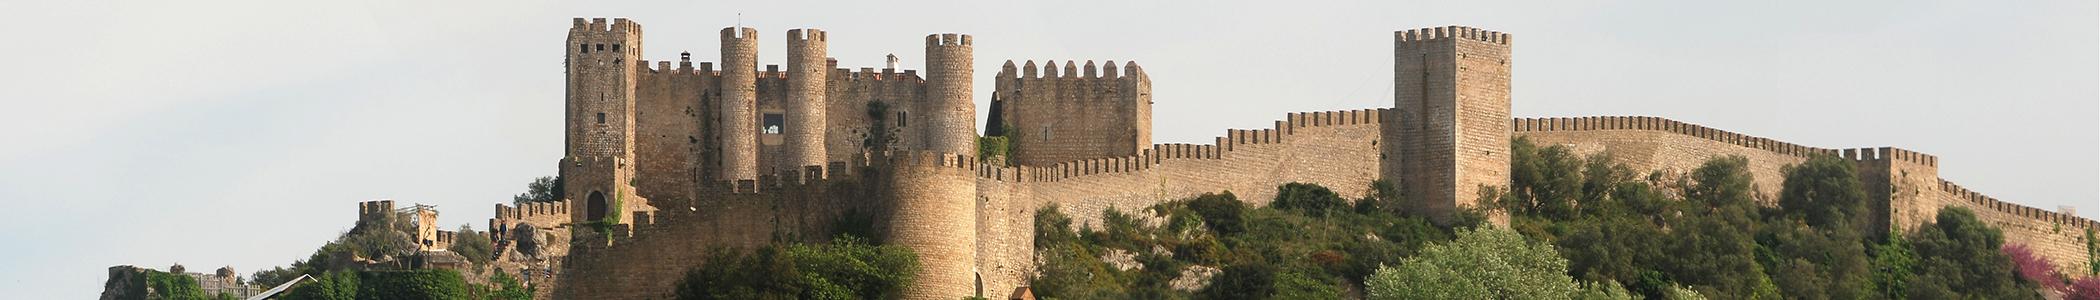 Obidos banner castle walls